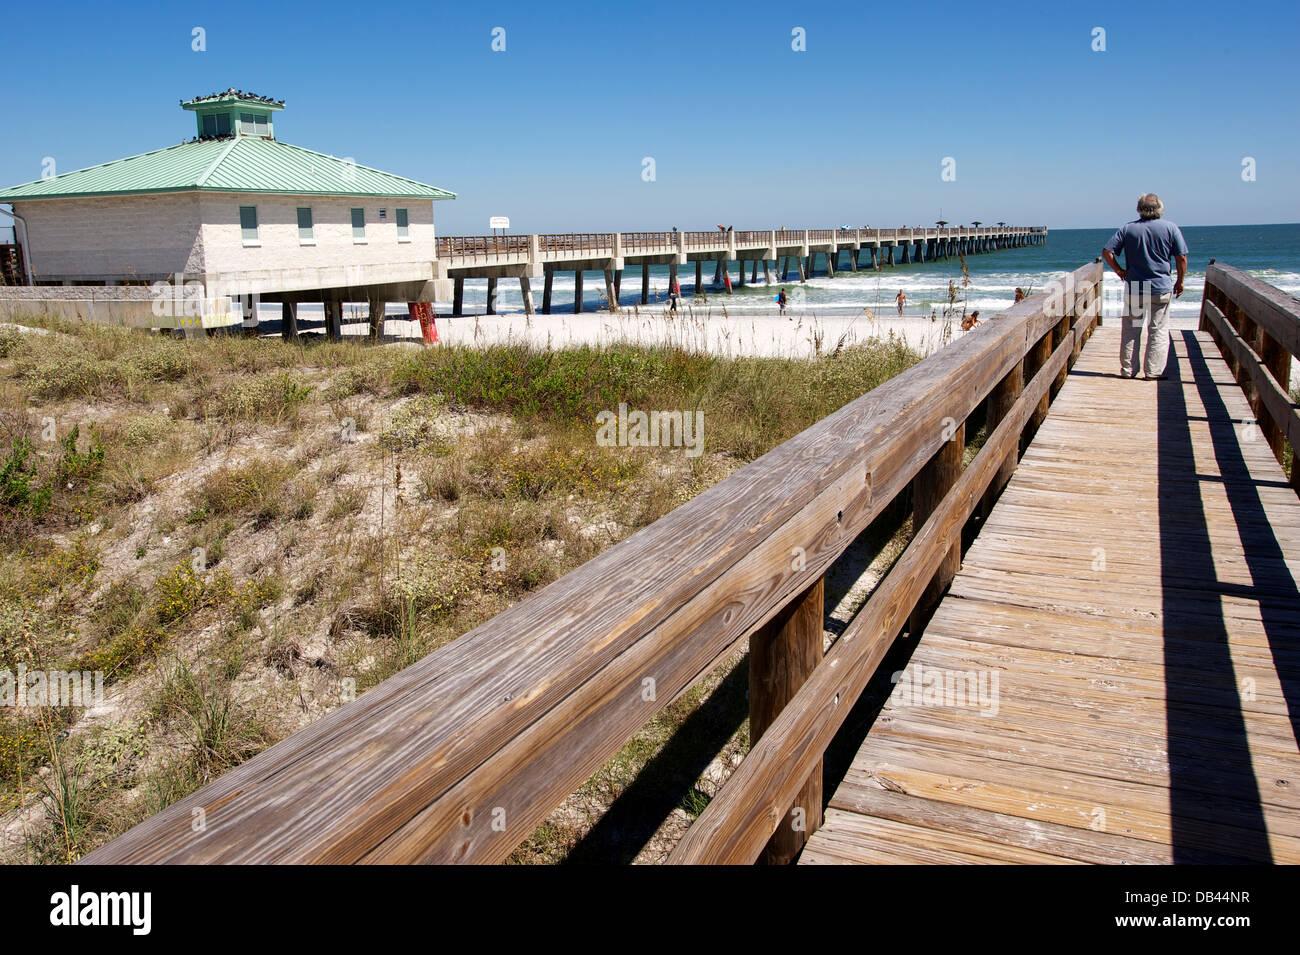 Runway to beach, Jacksonville Beach, Florida - Stock Image